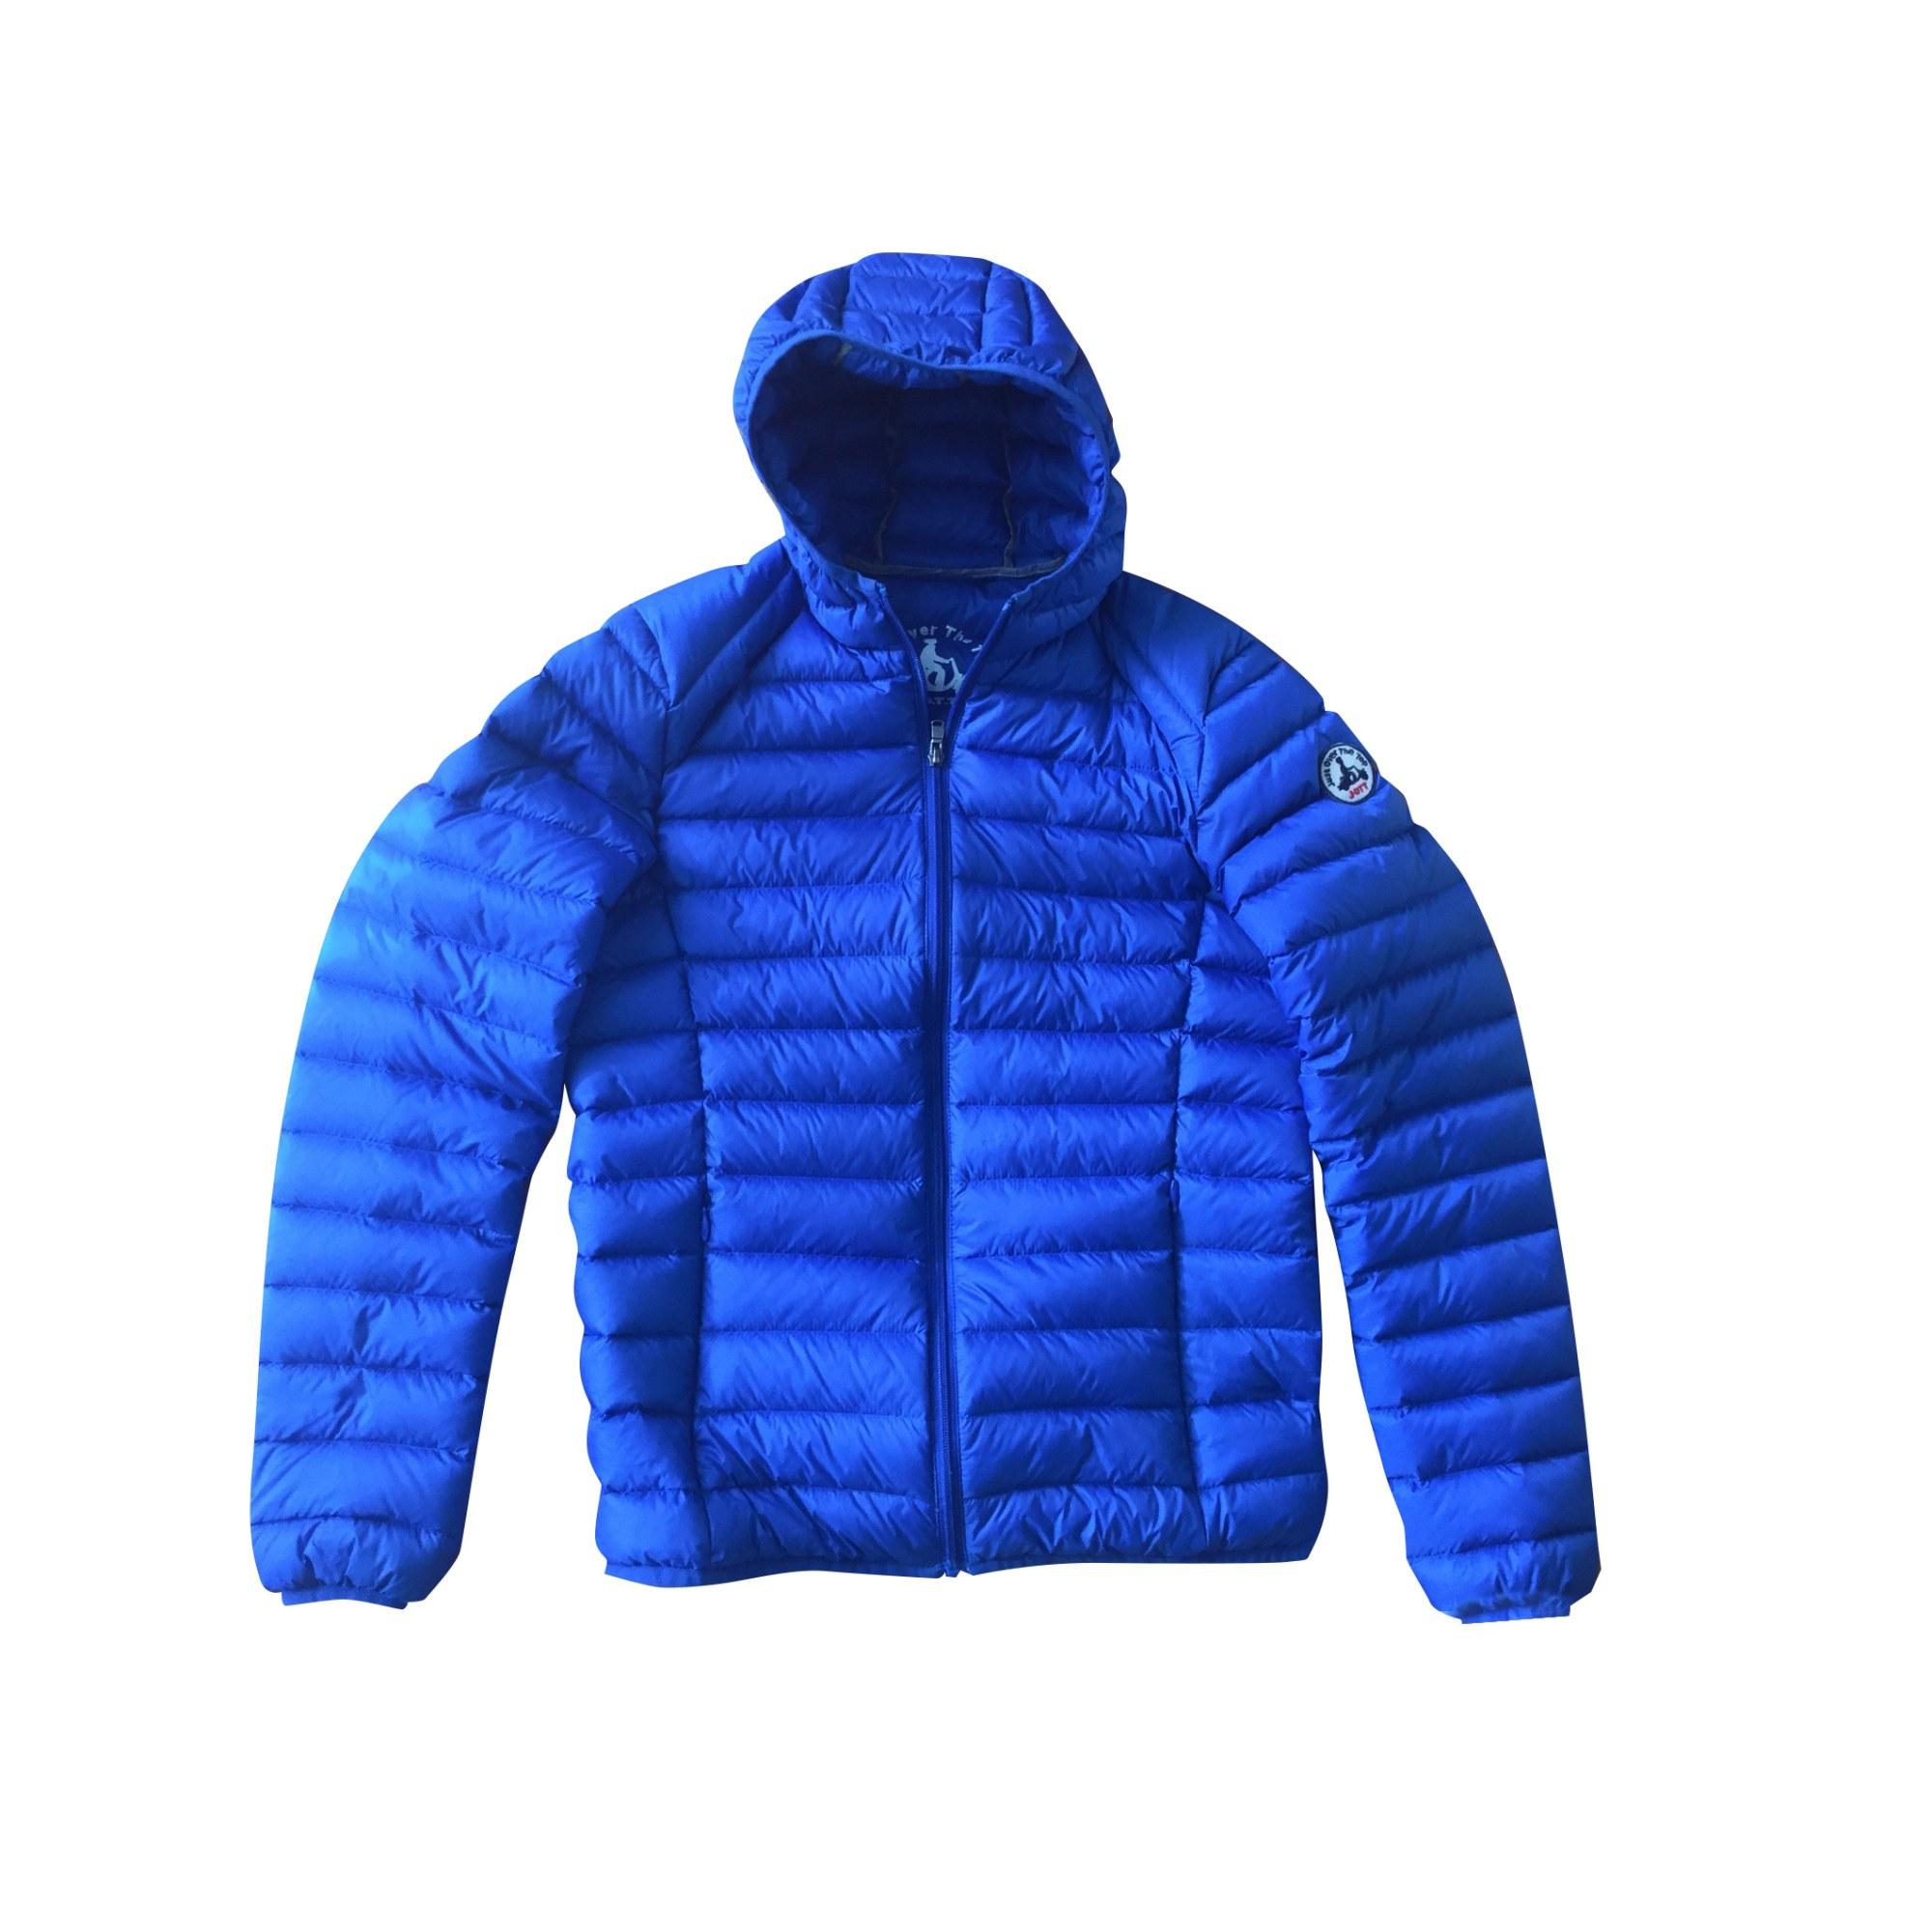 Doudoune JOTT Bleu, bleu marine, bleu turquoise